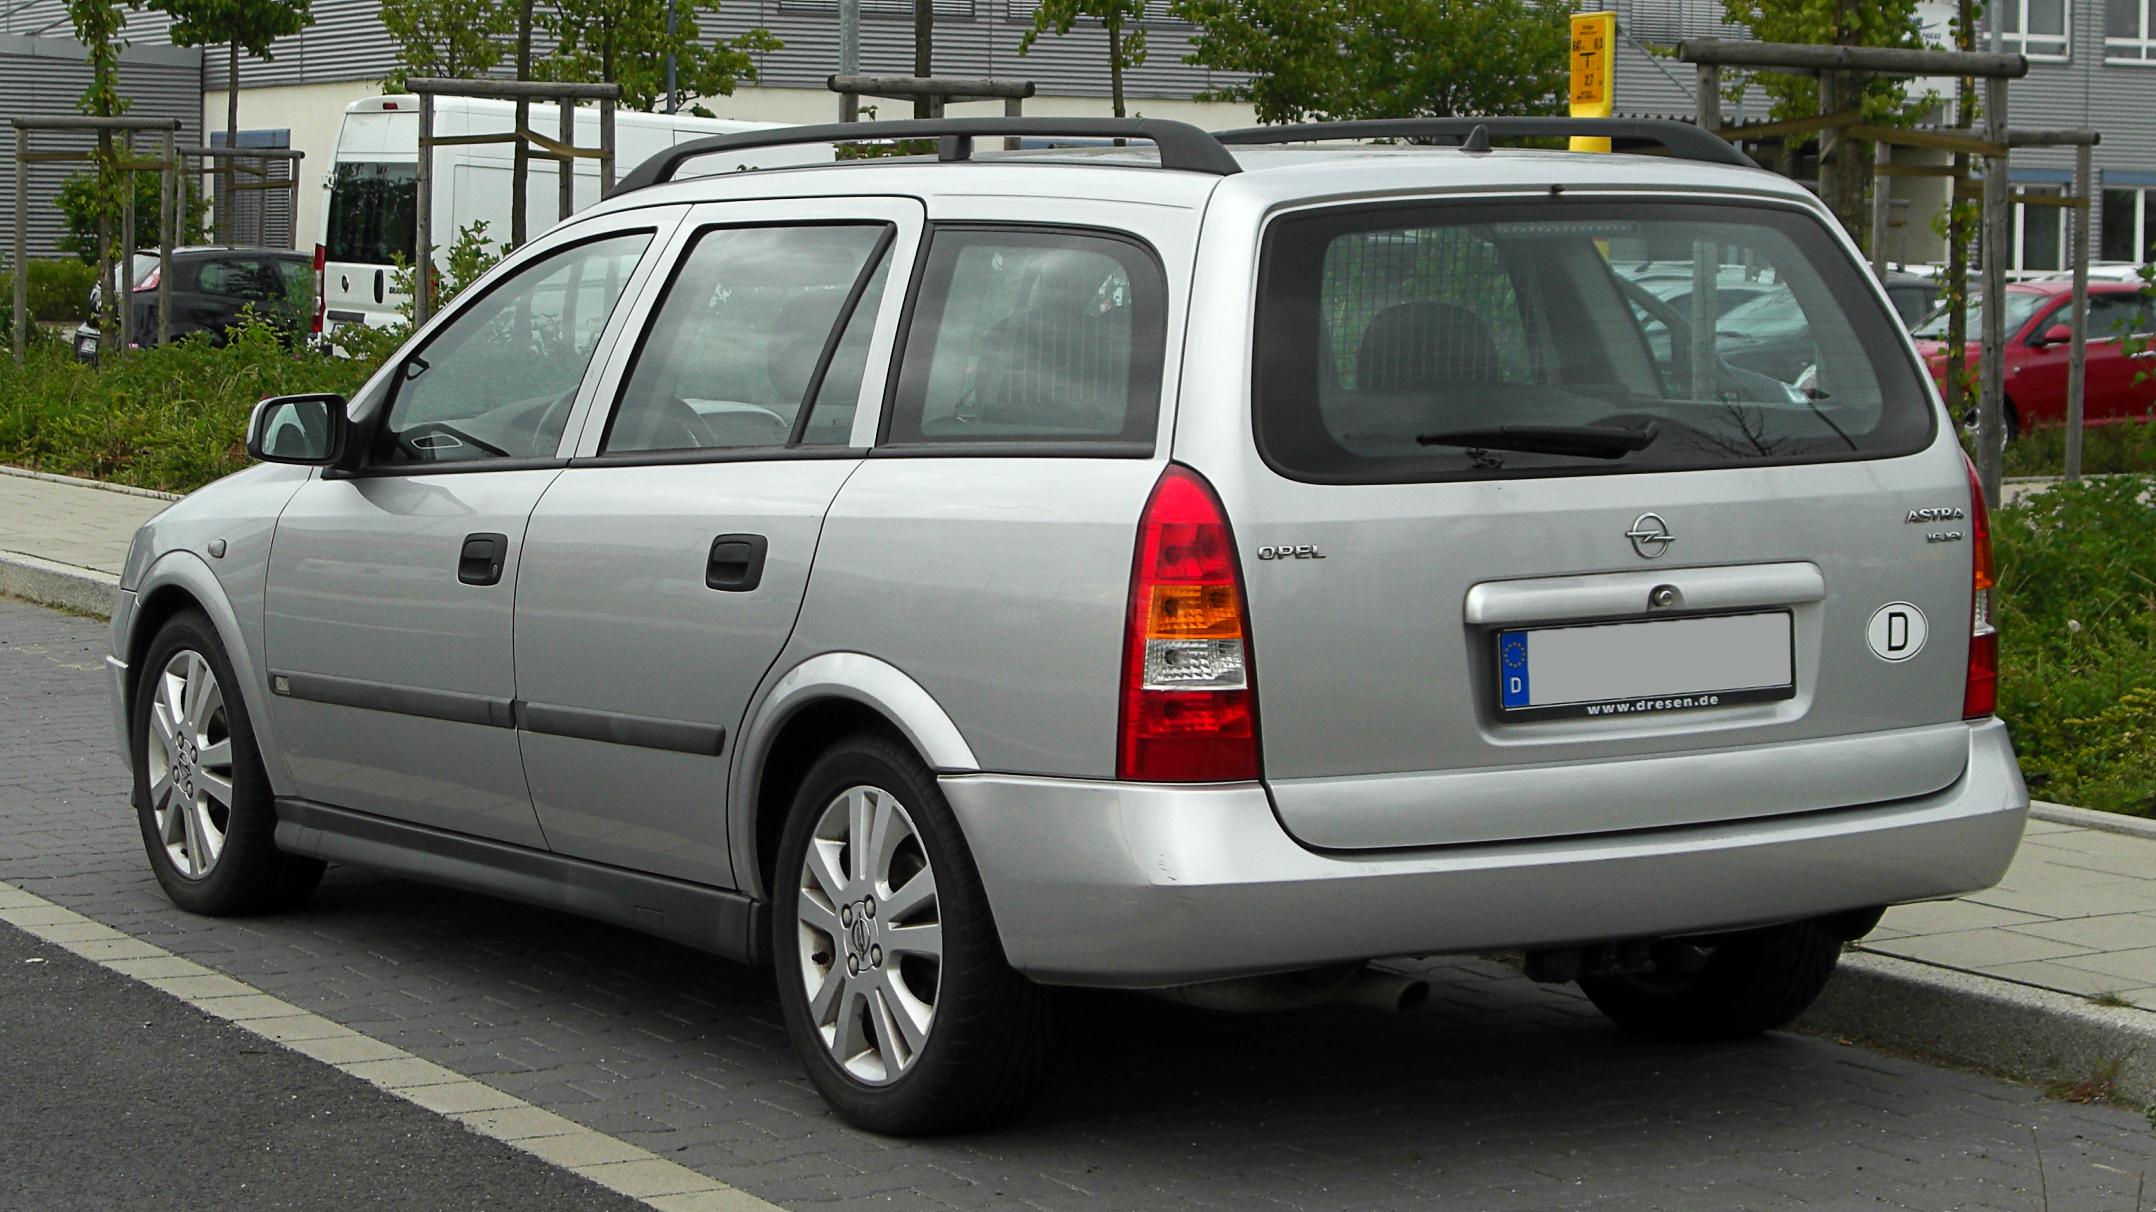 File Opel Astra Caravan 1 6 16v Selection G Heckansicht 28 Mai 2011 Dusseldorf Jpg Wikimedia Commons